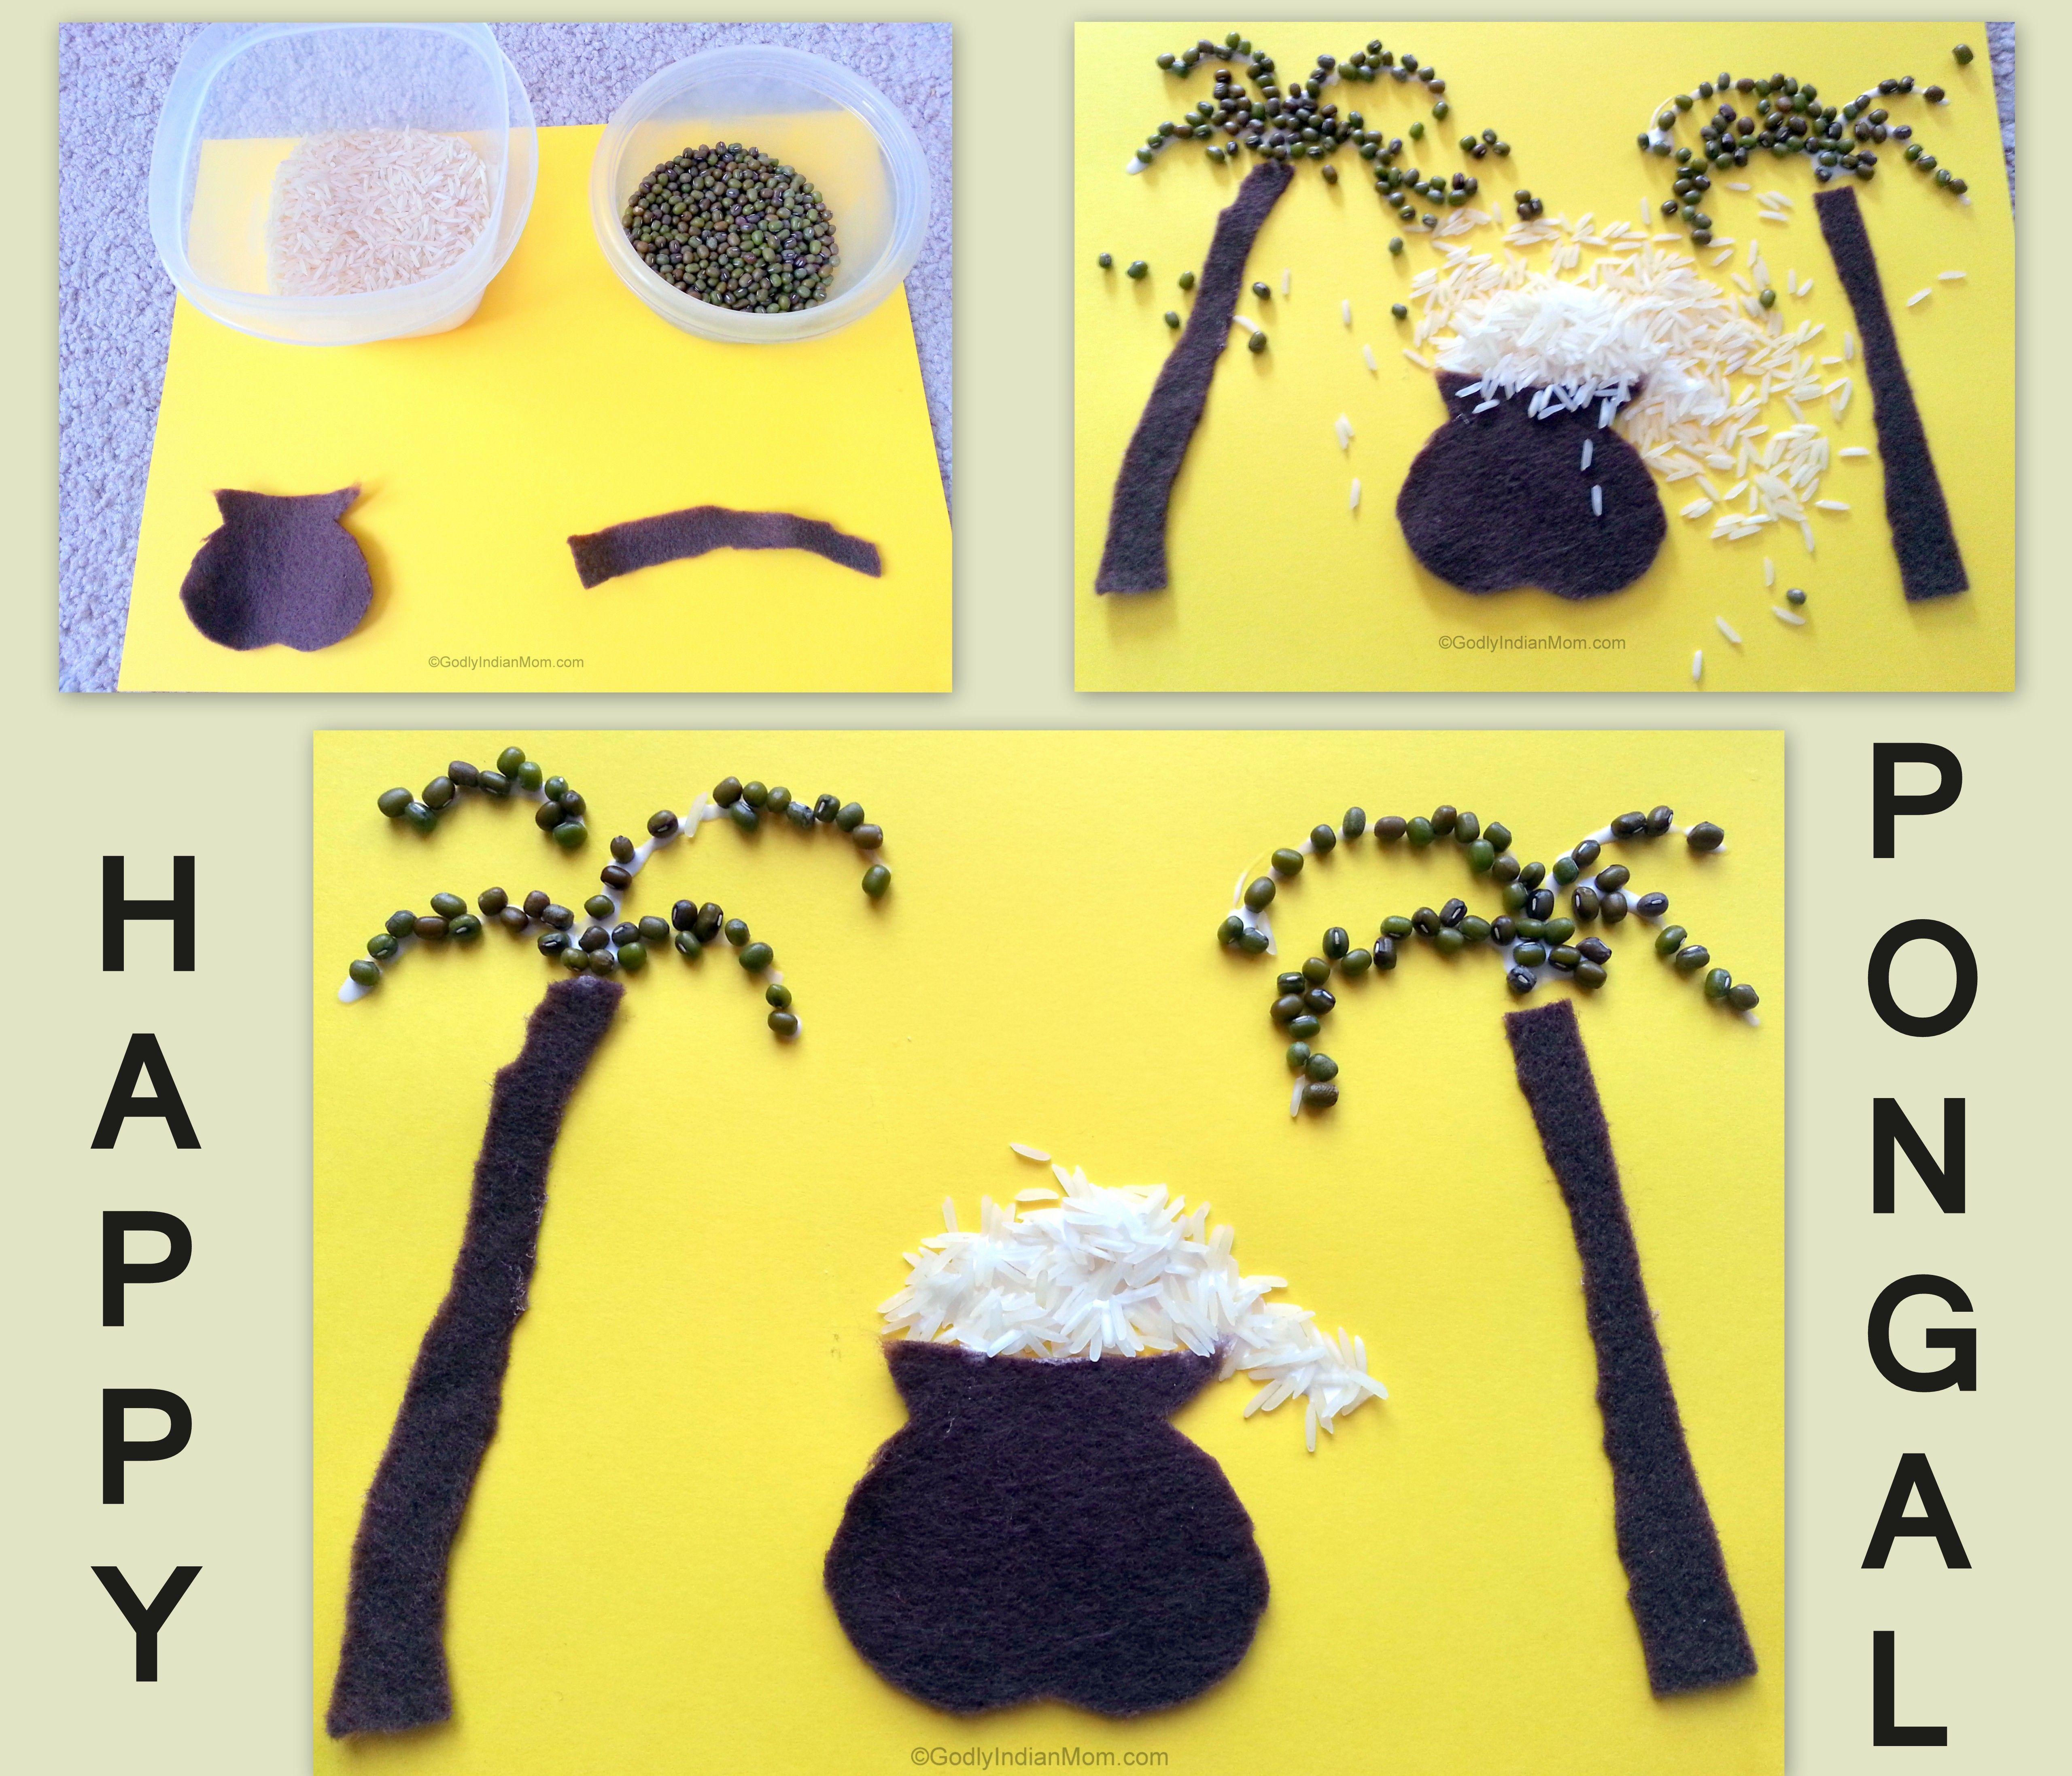 Pongal Craft / Grain Craft | Godly Indian Mom | Crafts ...